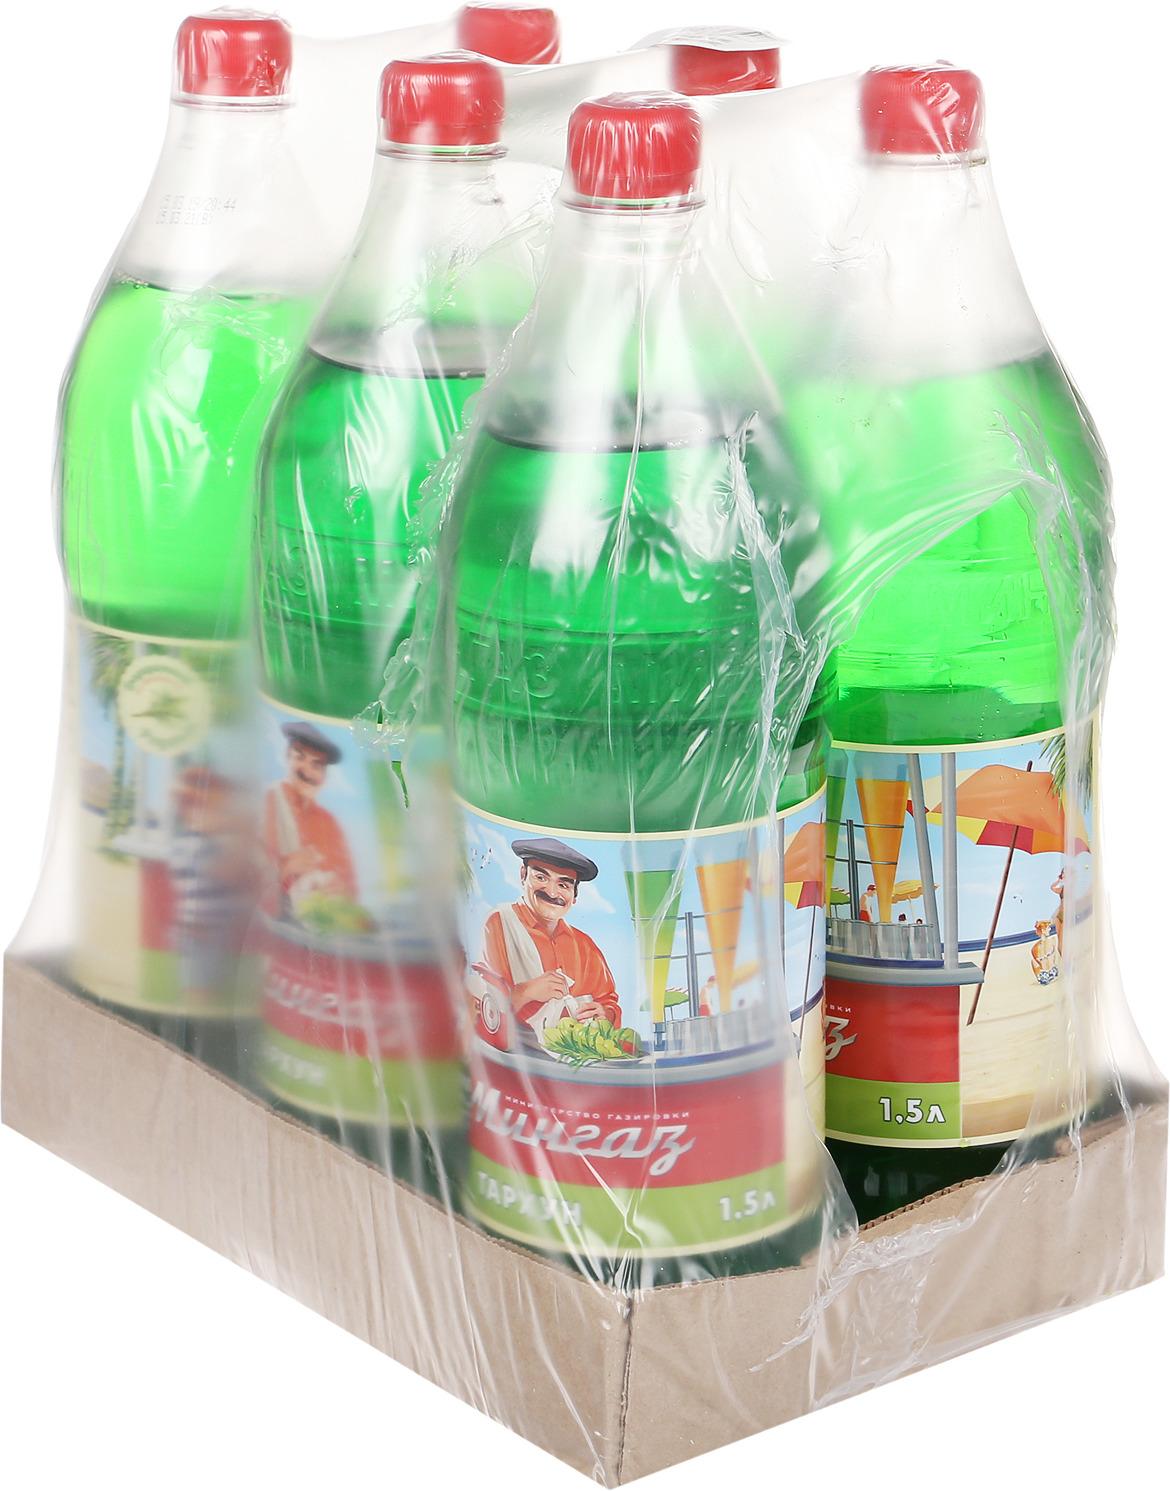 Лимонад Министерство Газировки Тархун, 6 шт по 1,5 л